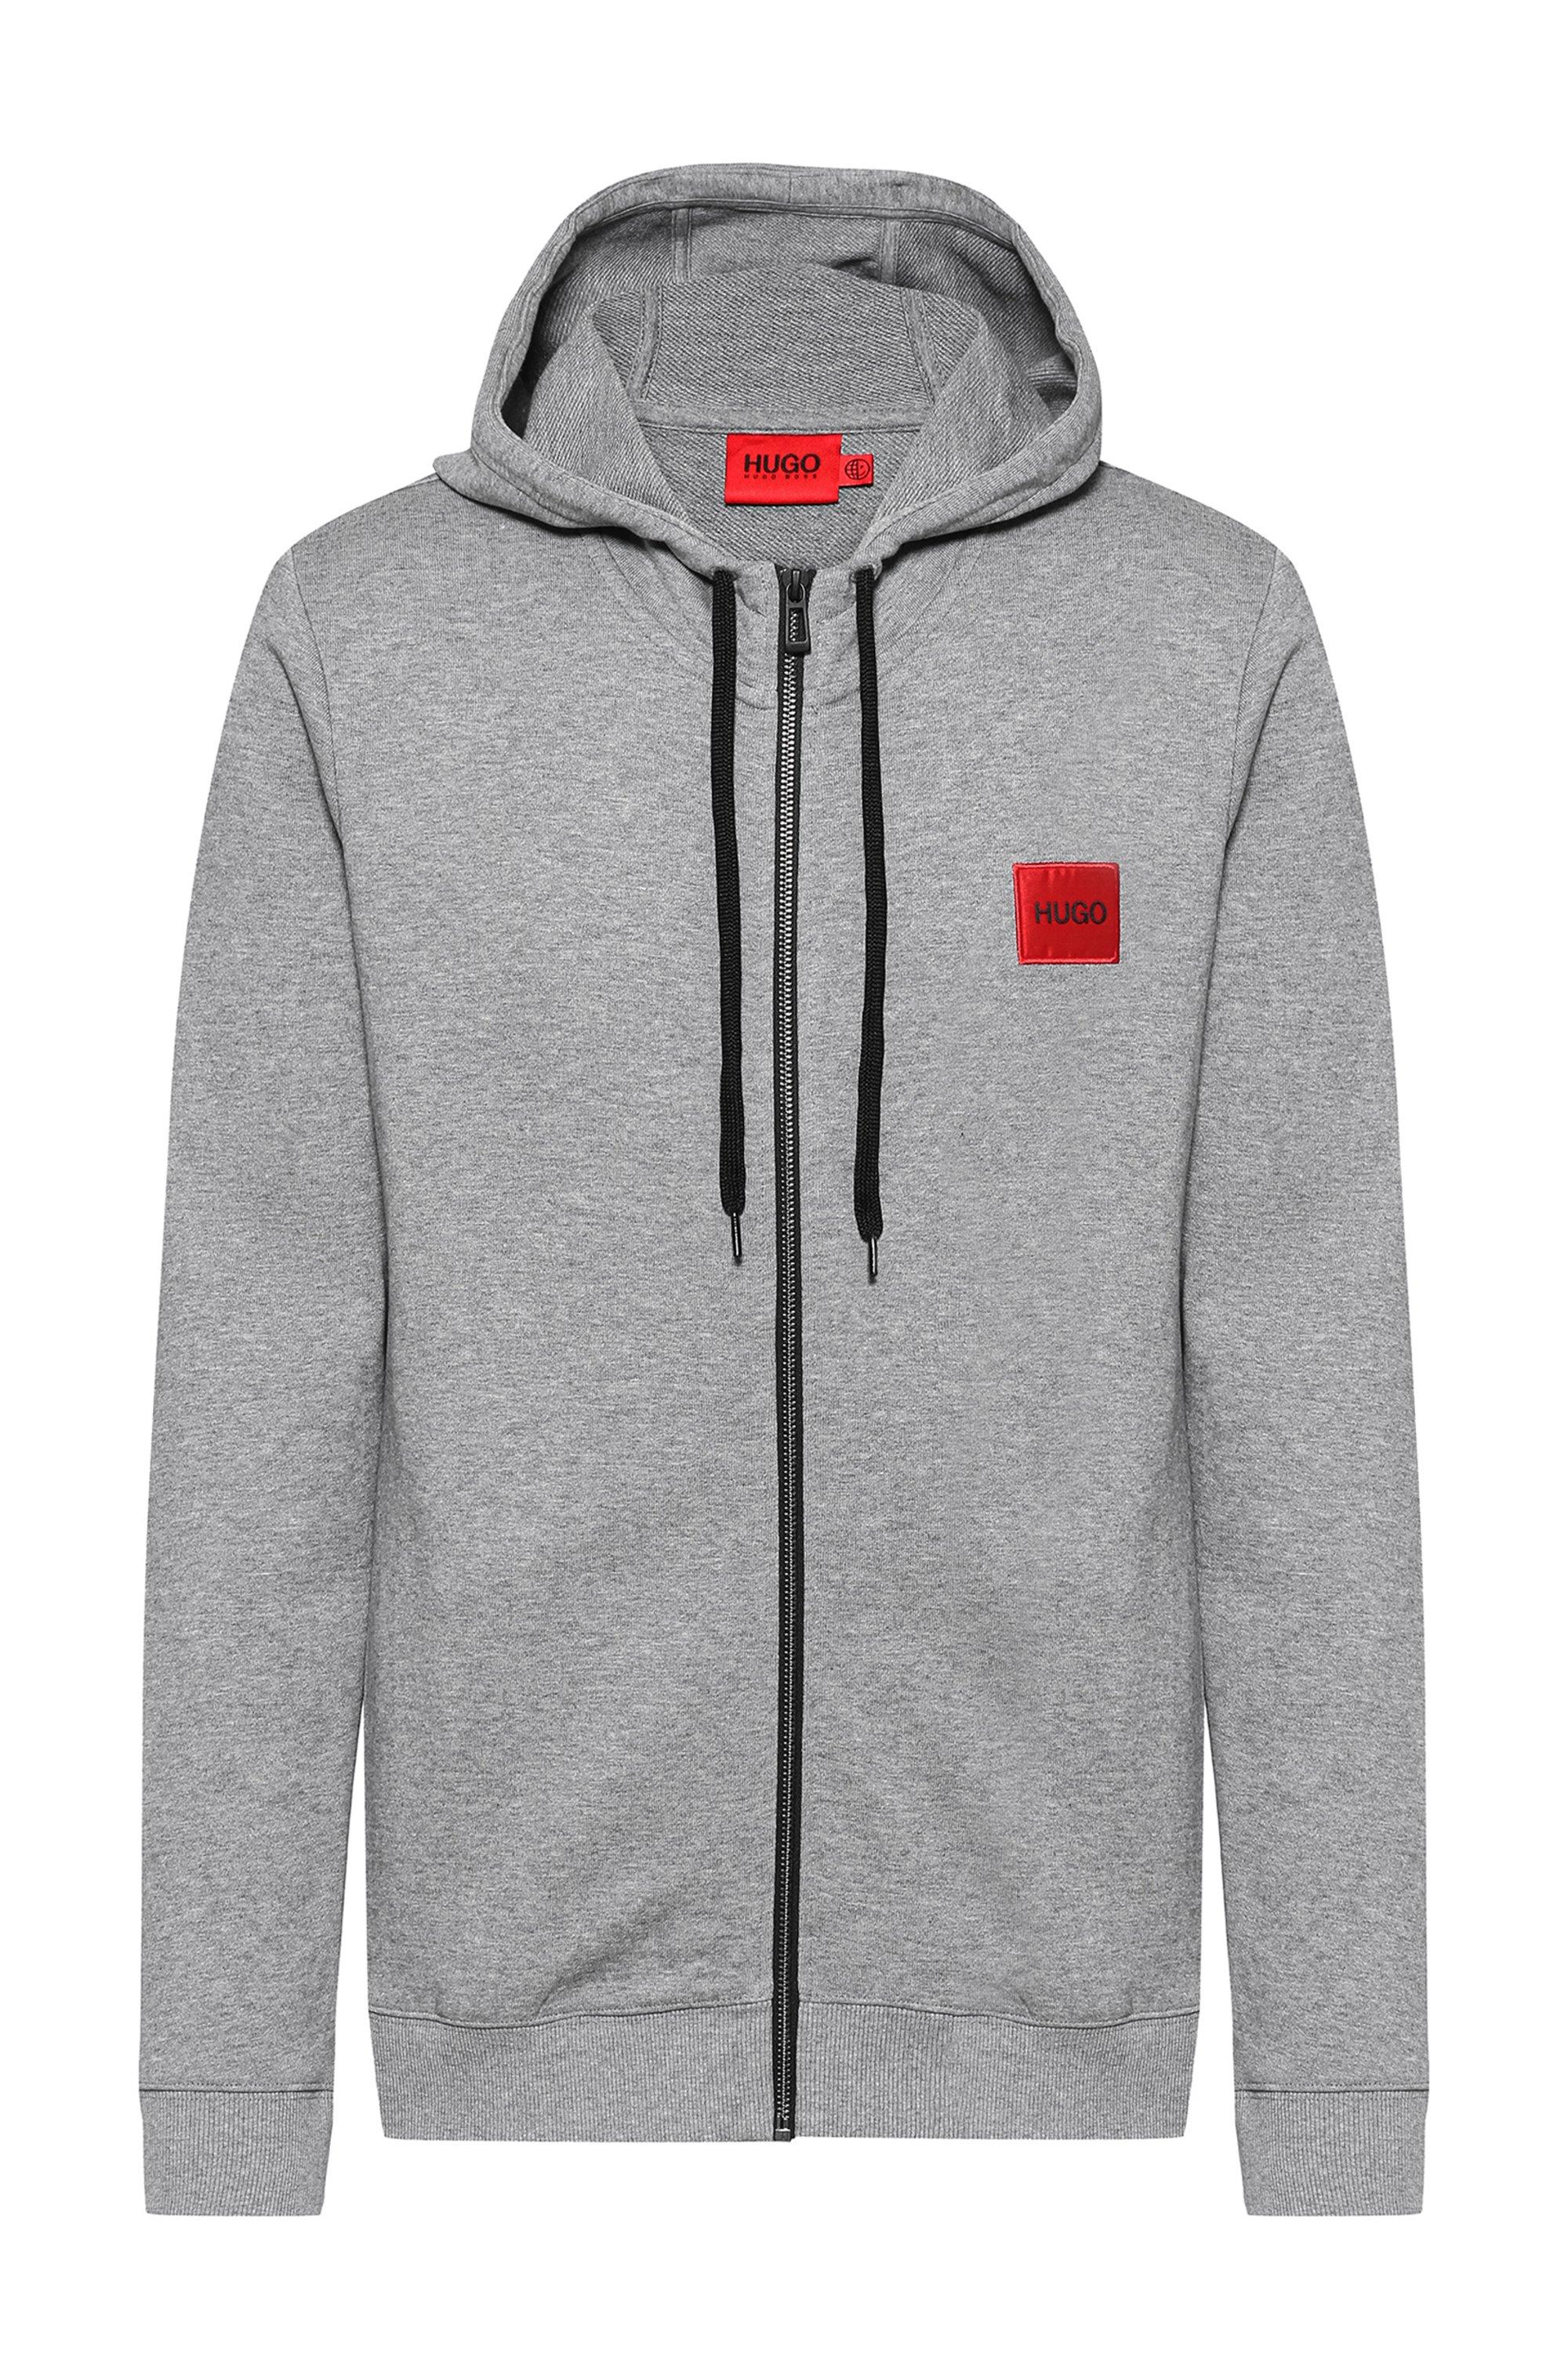 Zip-through sweatshirt in terry cotton with logo patch, Grey